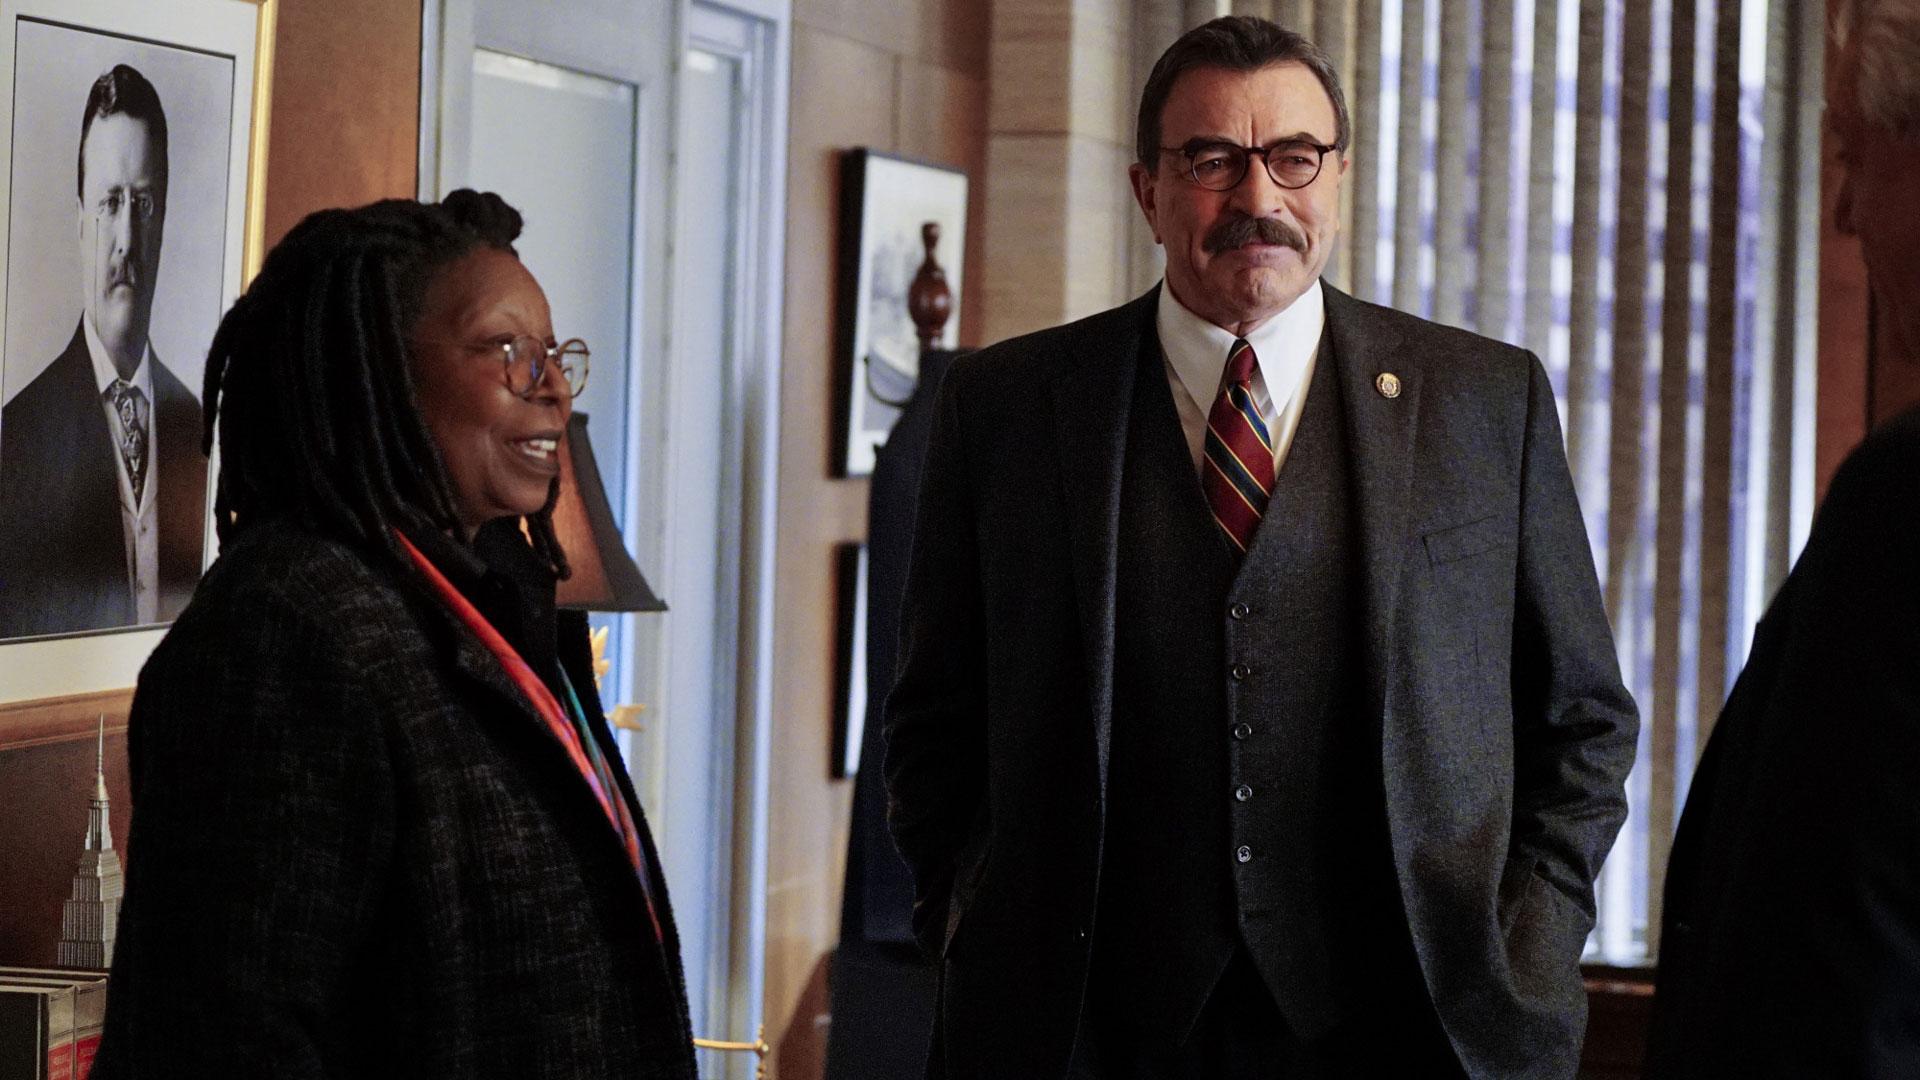 Whoopi Goldberg as City Council Speaker Regina Thomas and Tom Selleck as Frank Reagan